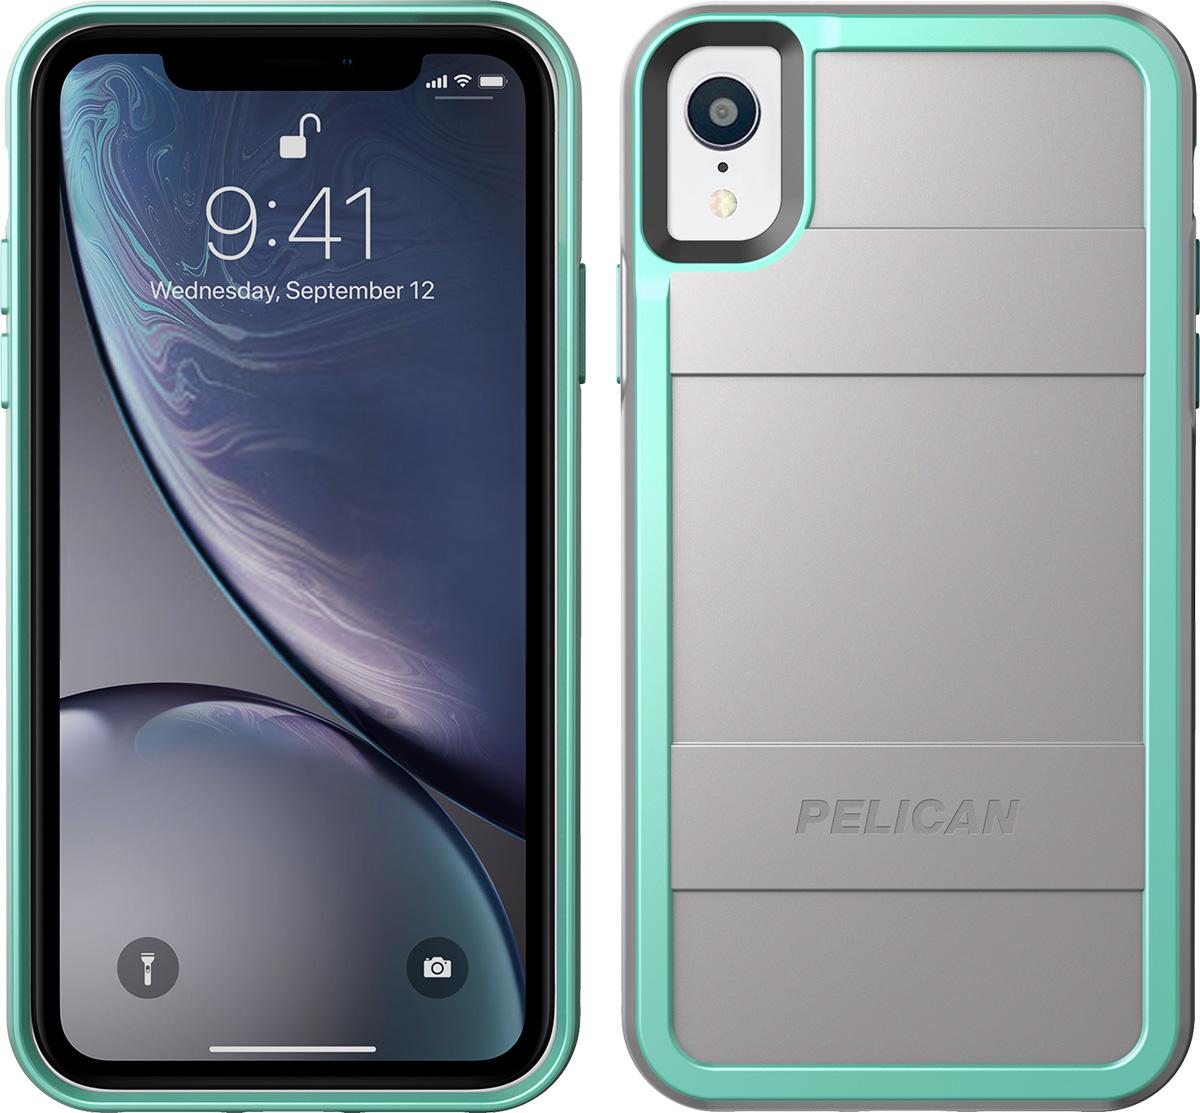 pelican apple iphone c42000 protector grey aqua phone case